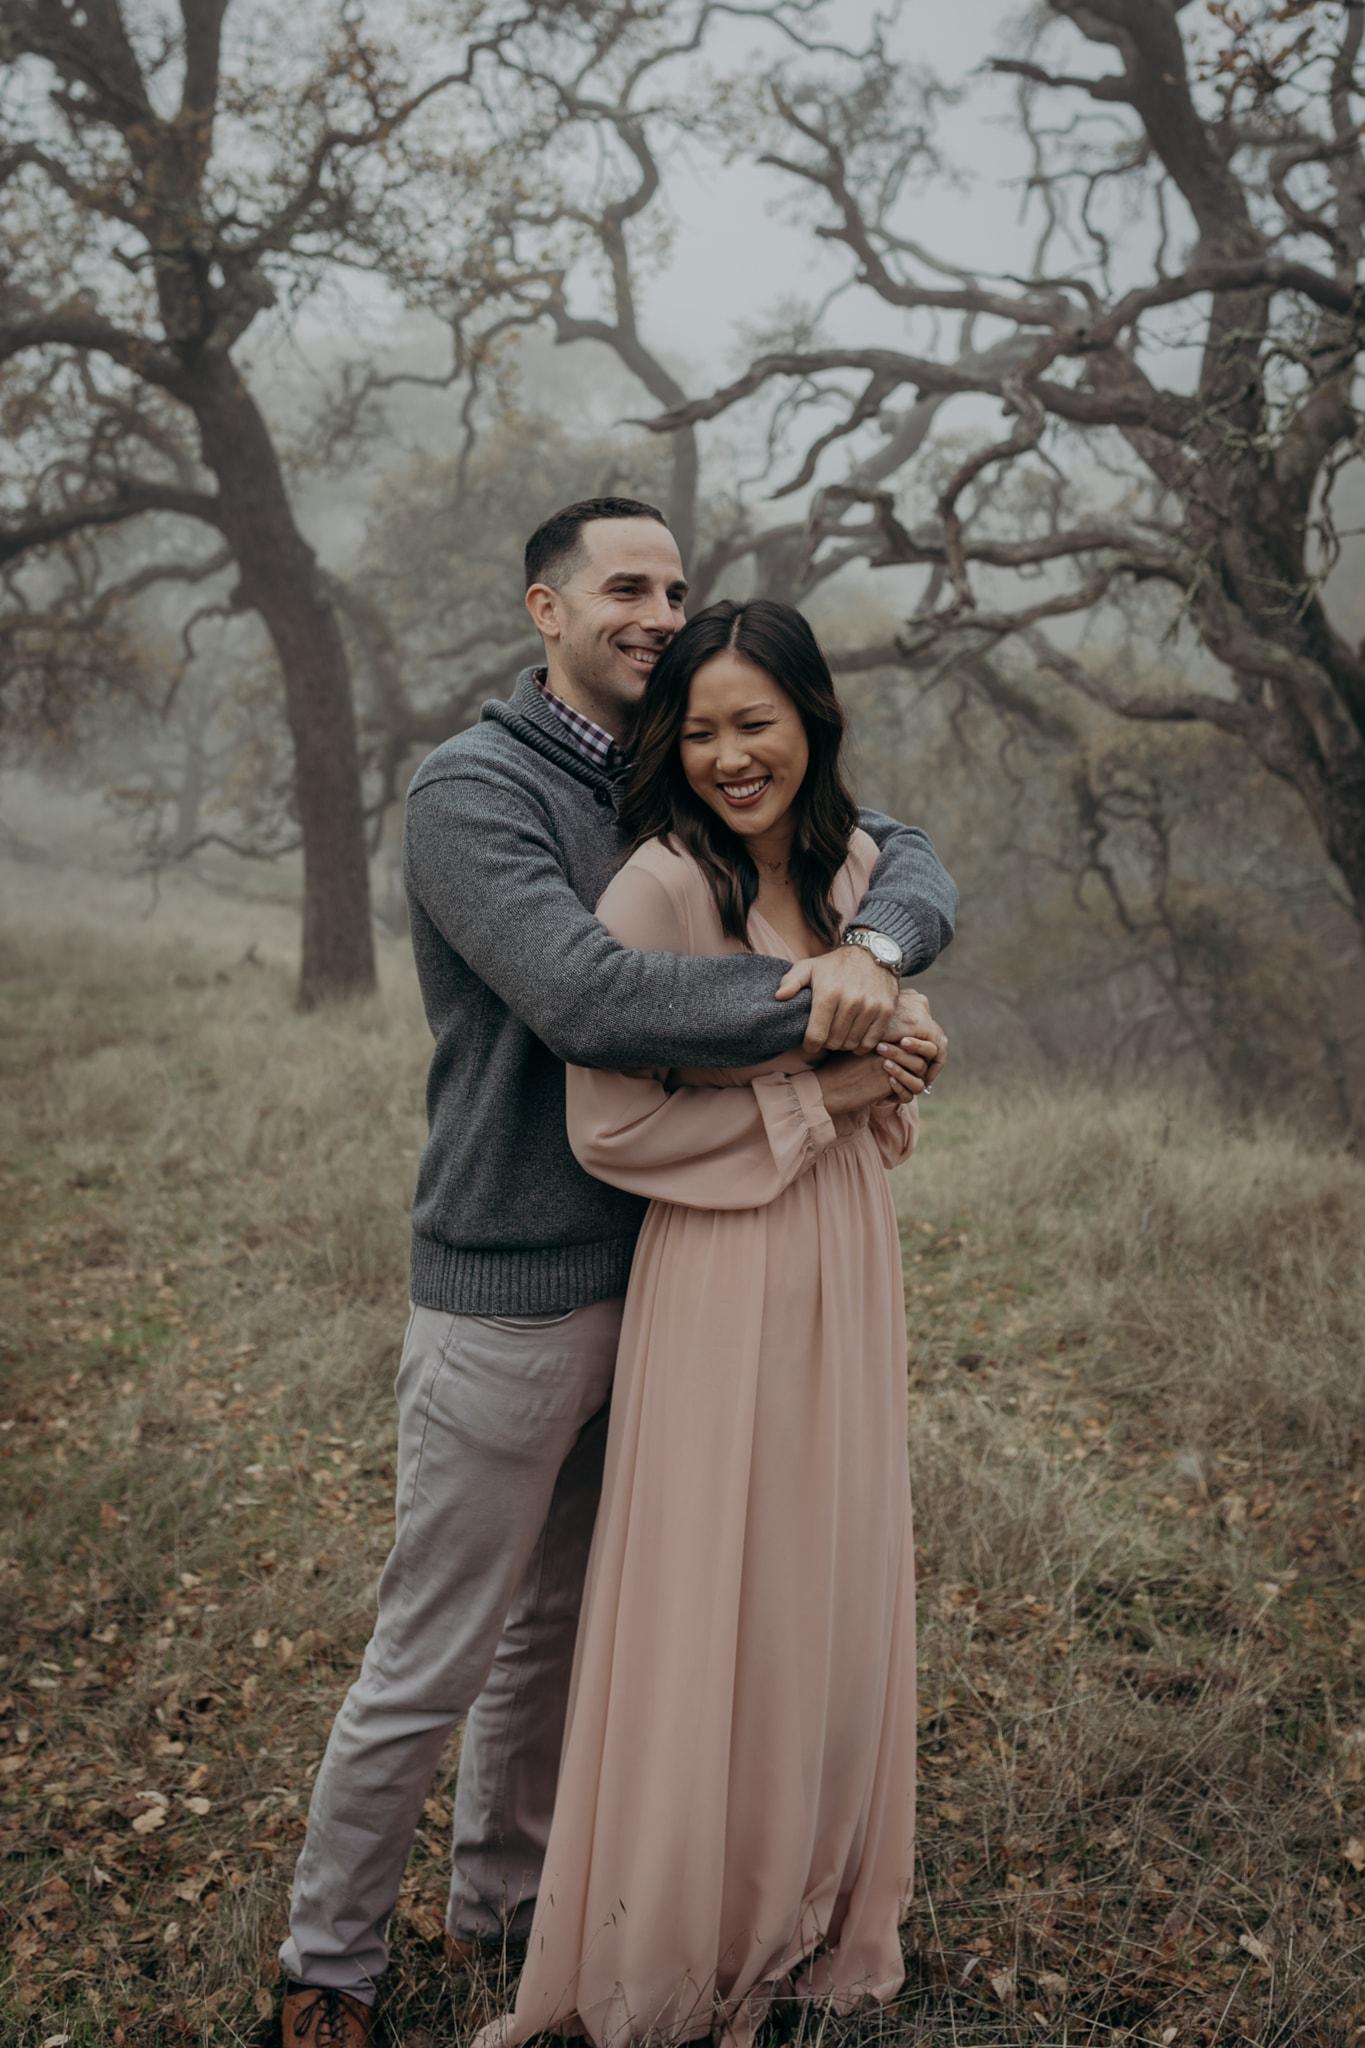 Walnut Creek Engagement Session Couple Lulus Dress